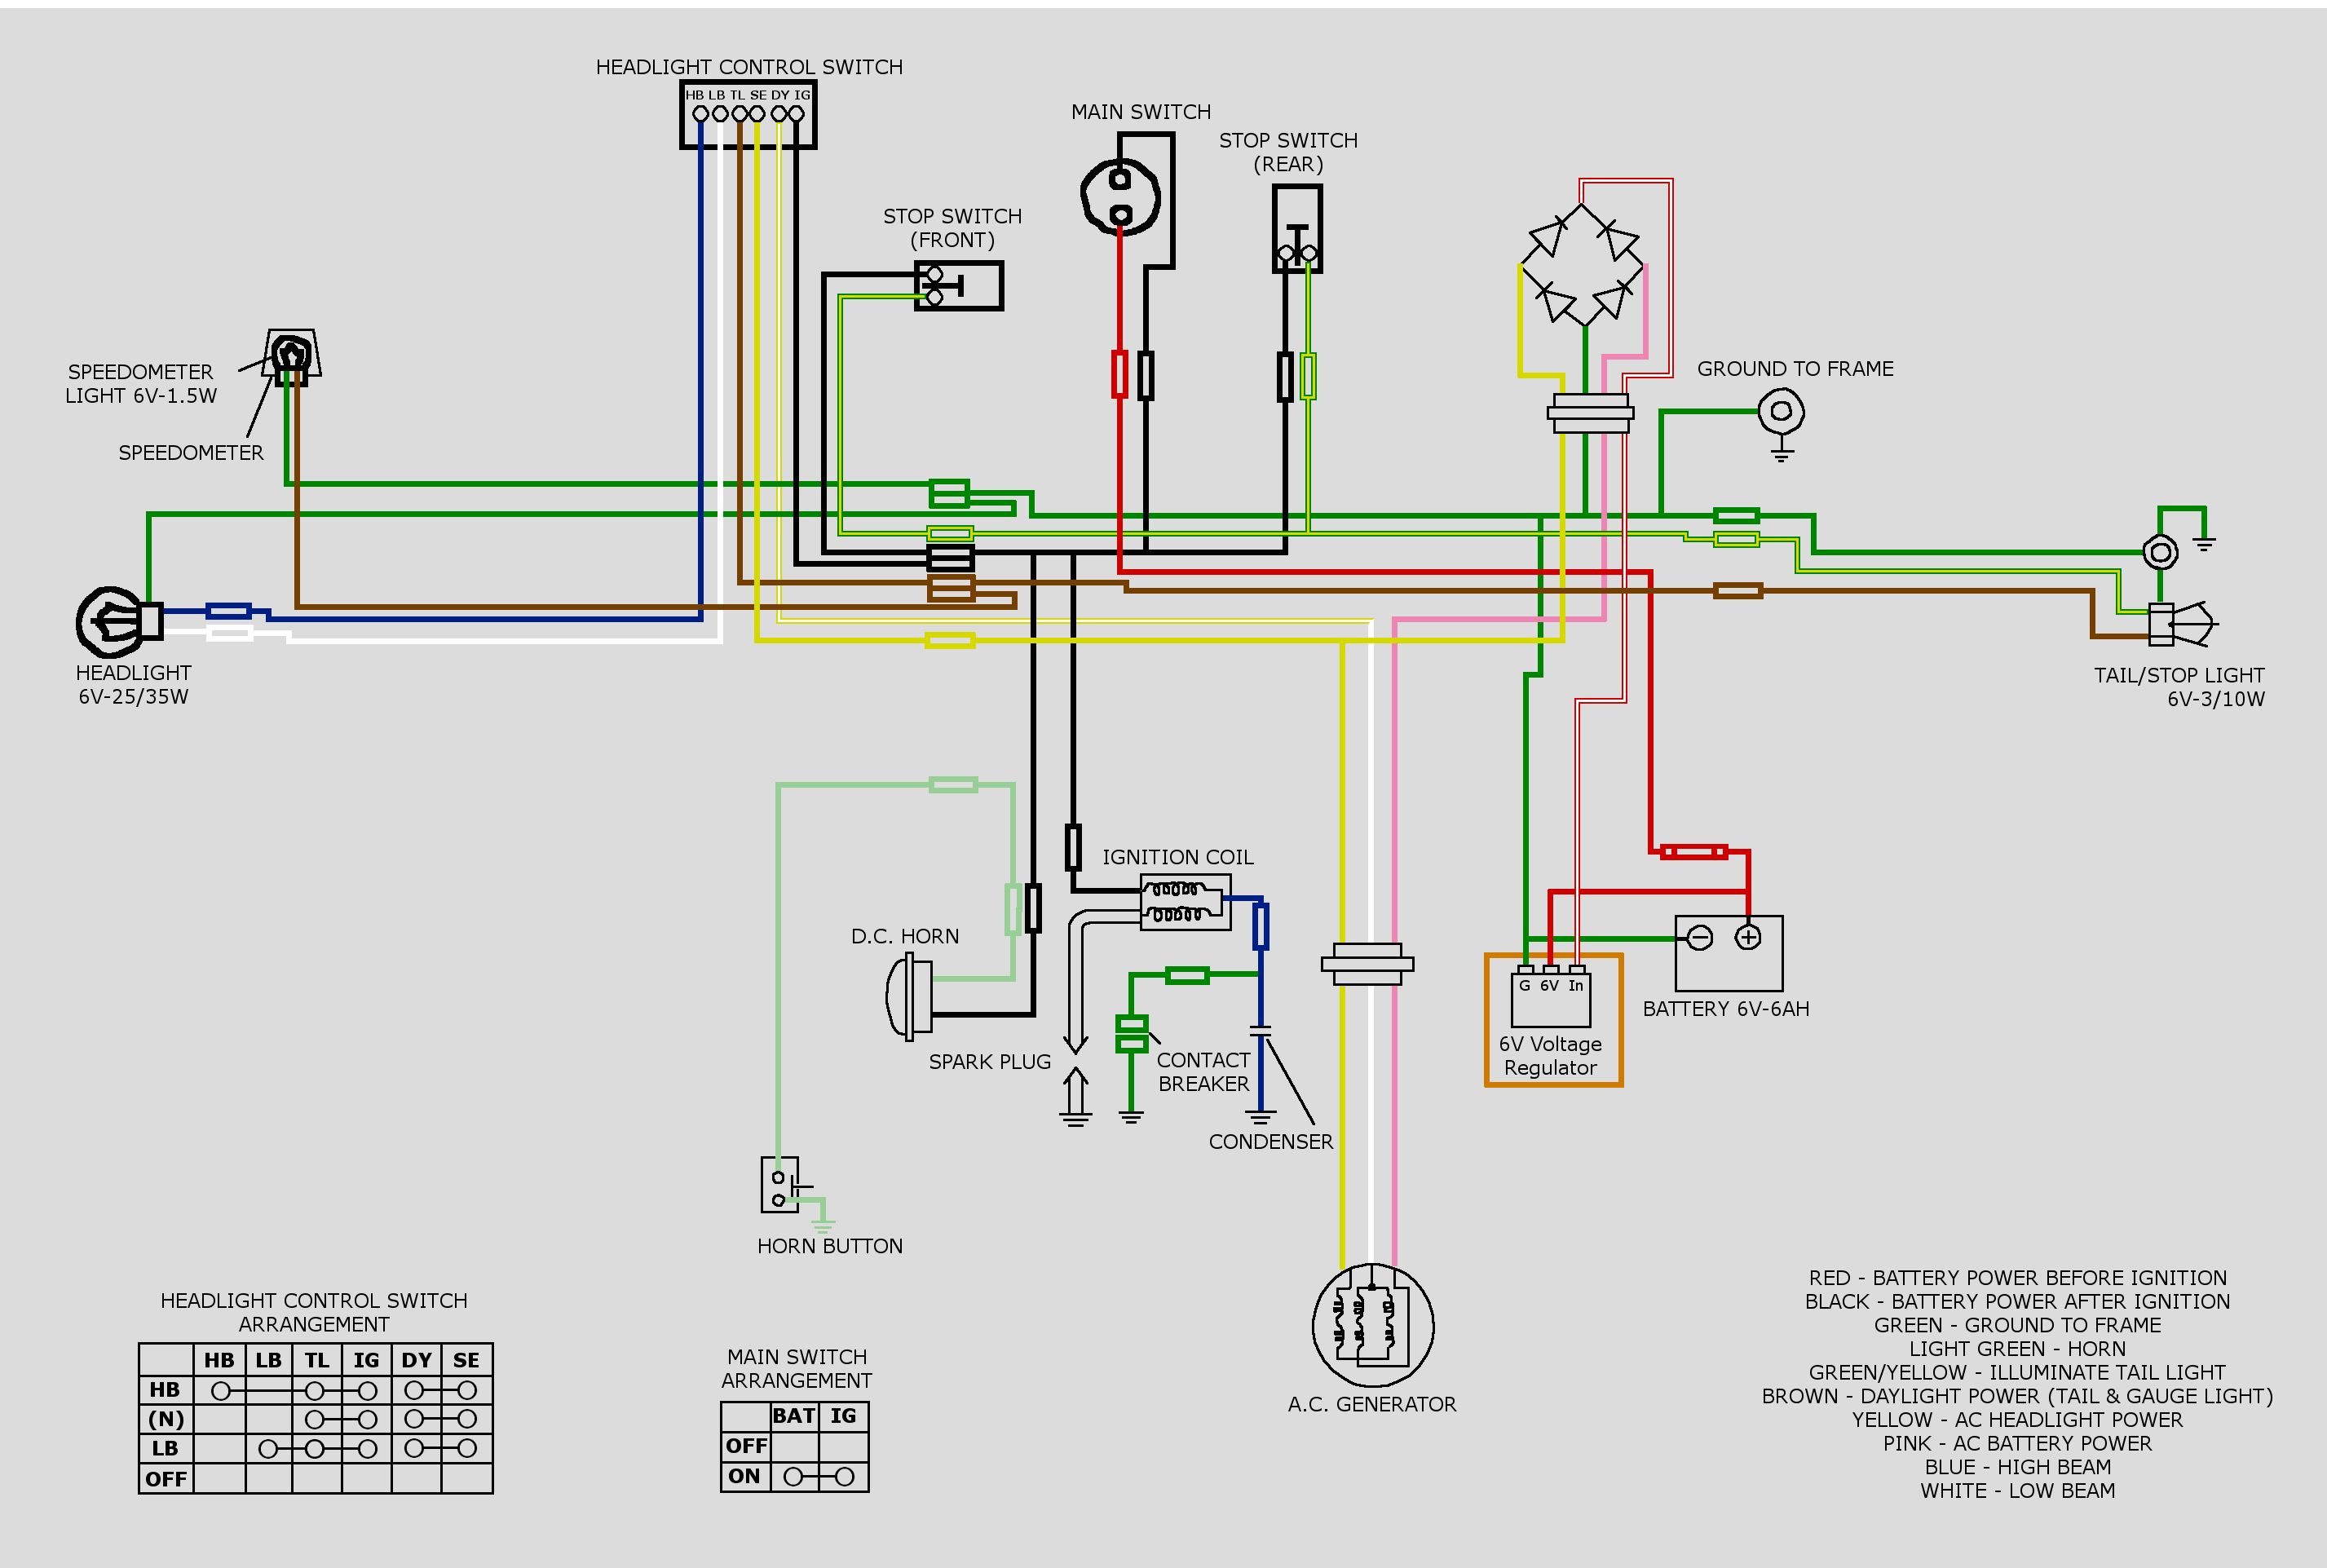 Honda 125 Wiring Diagram - wiring diagram series-page -  series-page.albergoinsicilia.itseries-page.albergoinsicilia.it